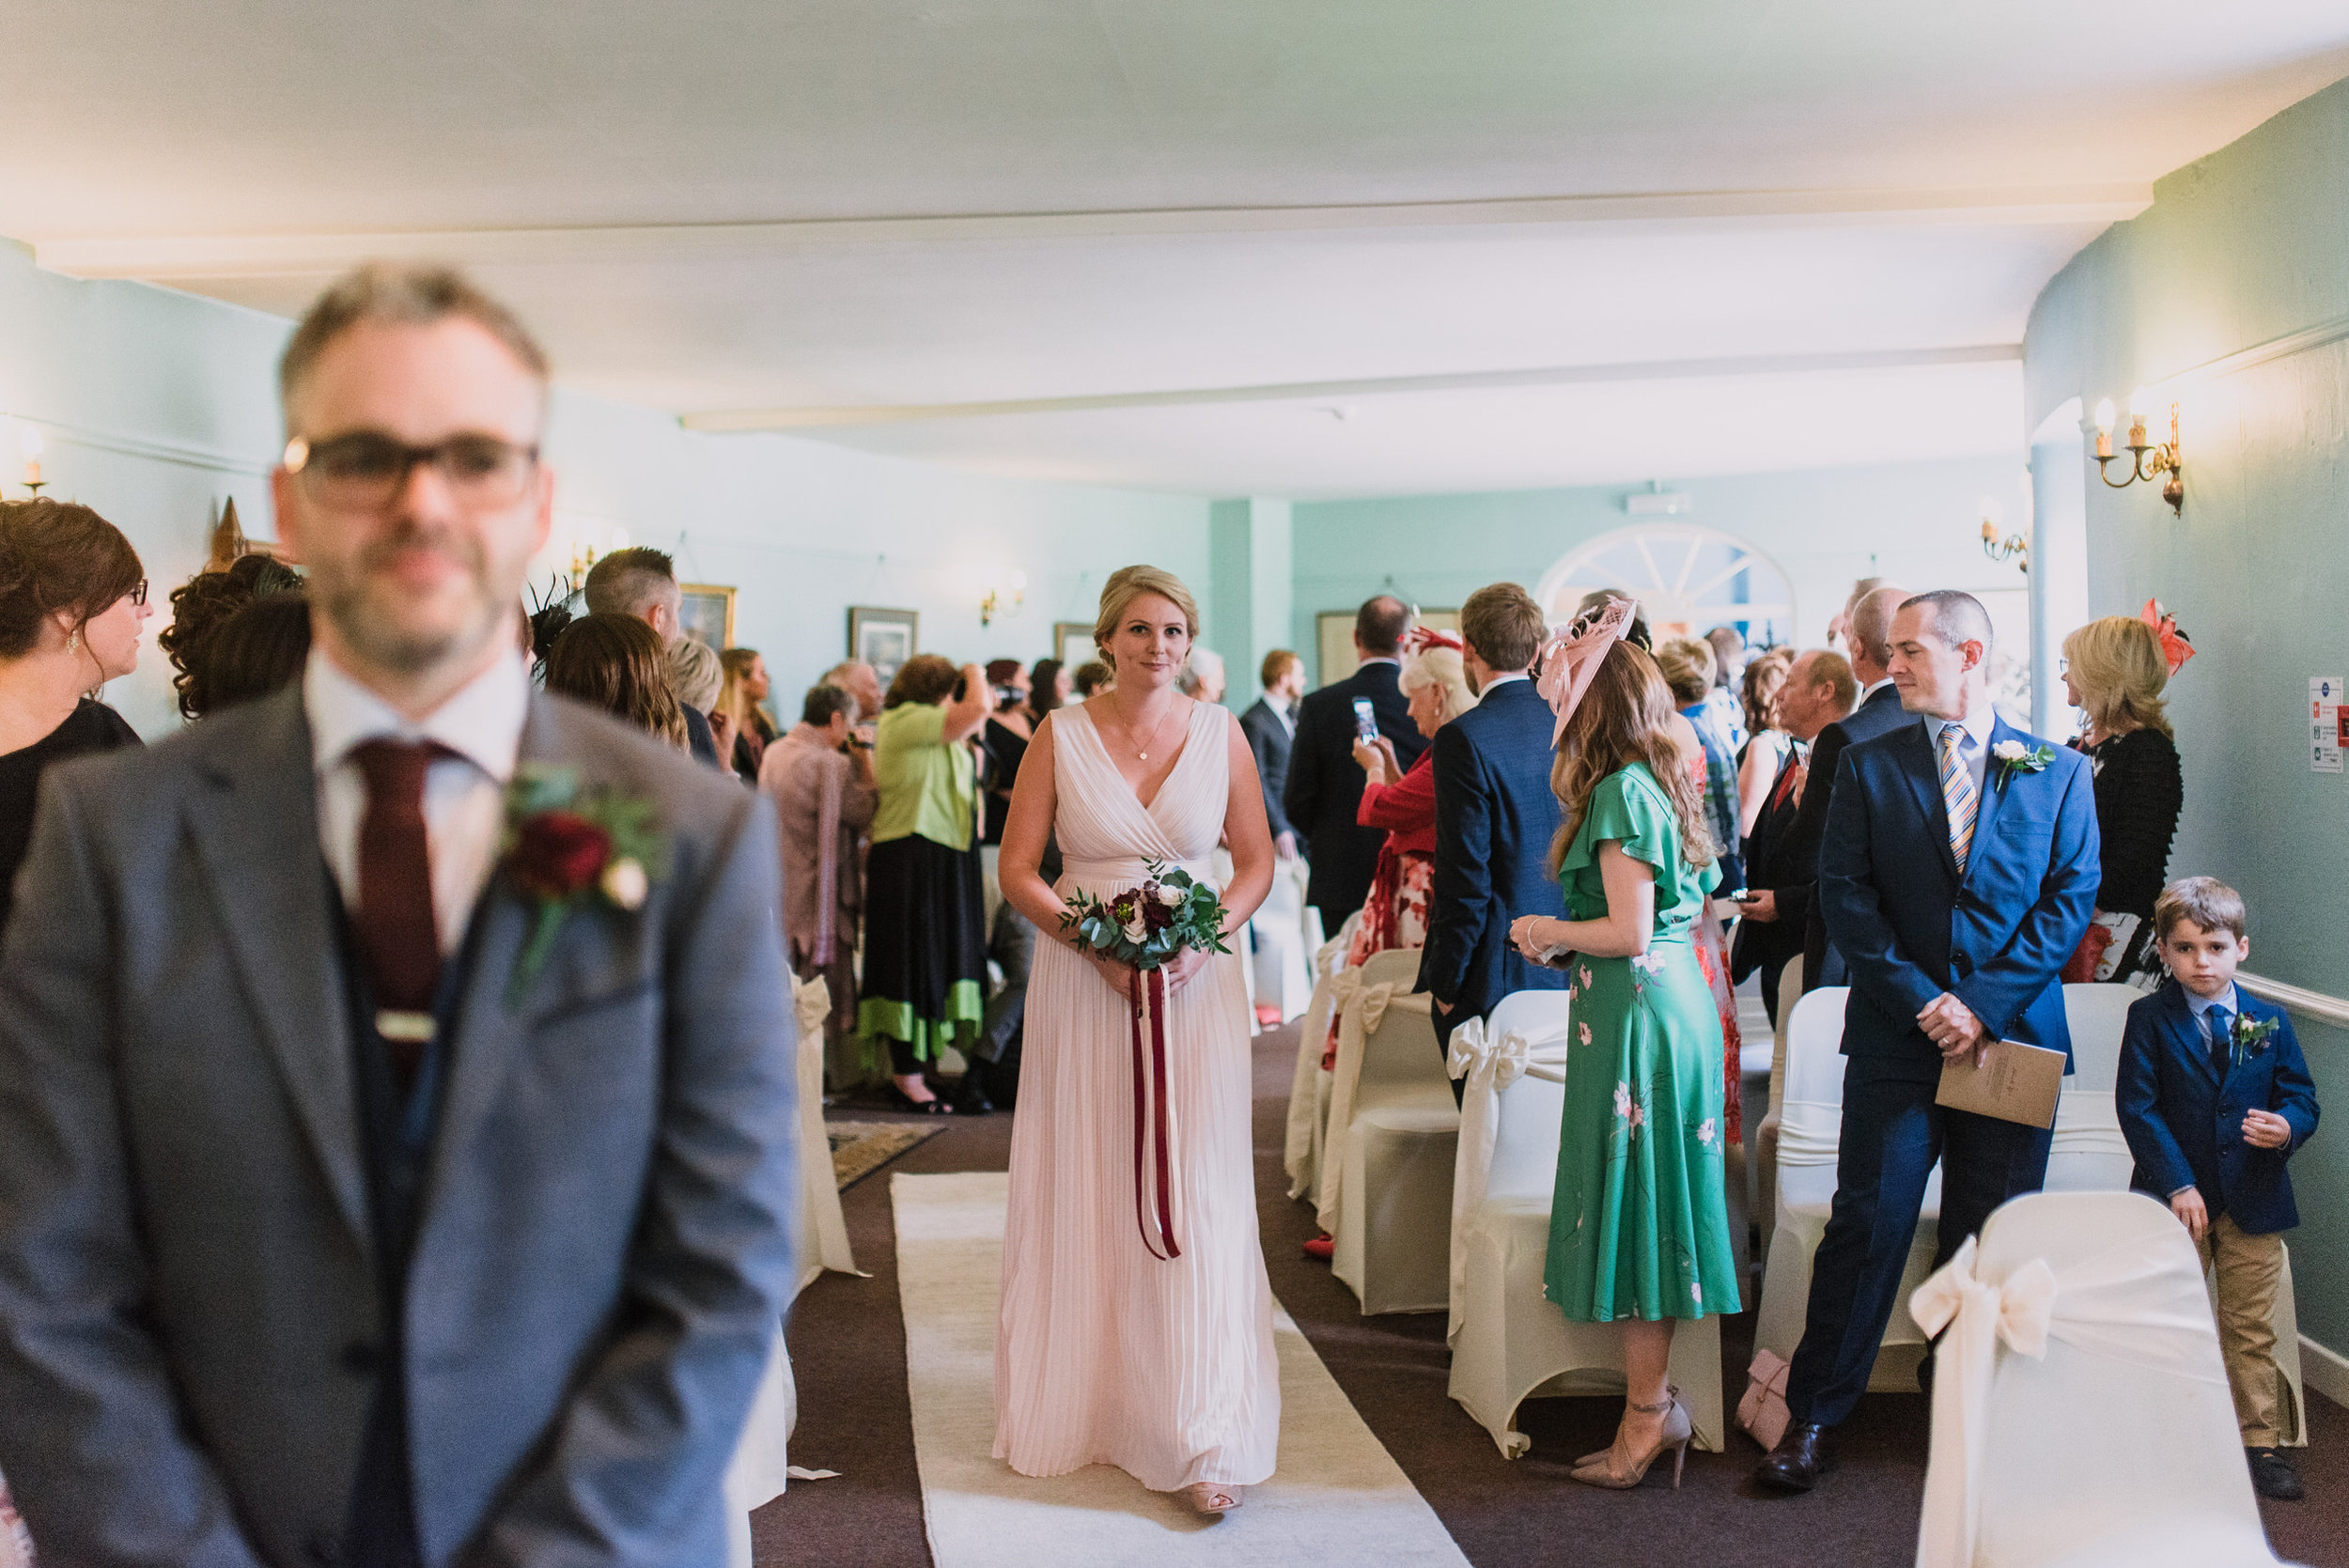 lissanoure castle wedding, northern ireland wedding photographer, romantic northern irish wedding venue, castle wedding ireland, natural wedding photography ni (44).jpg